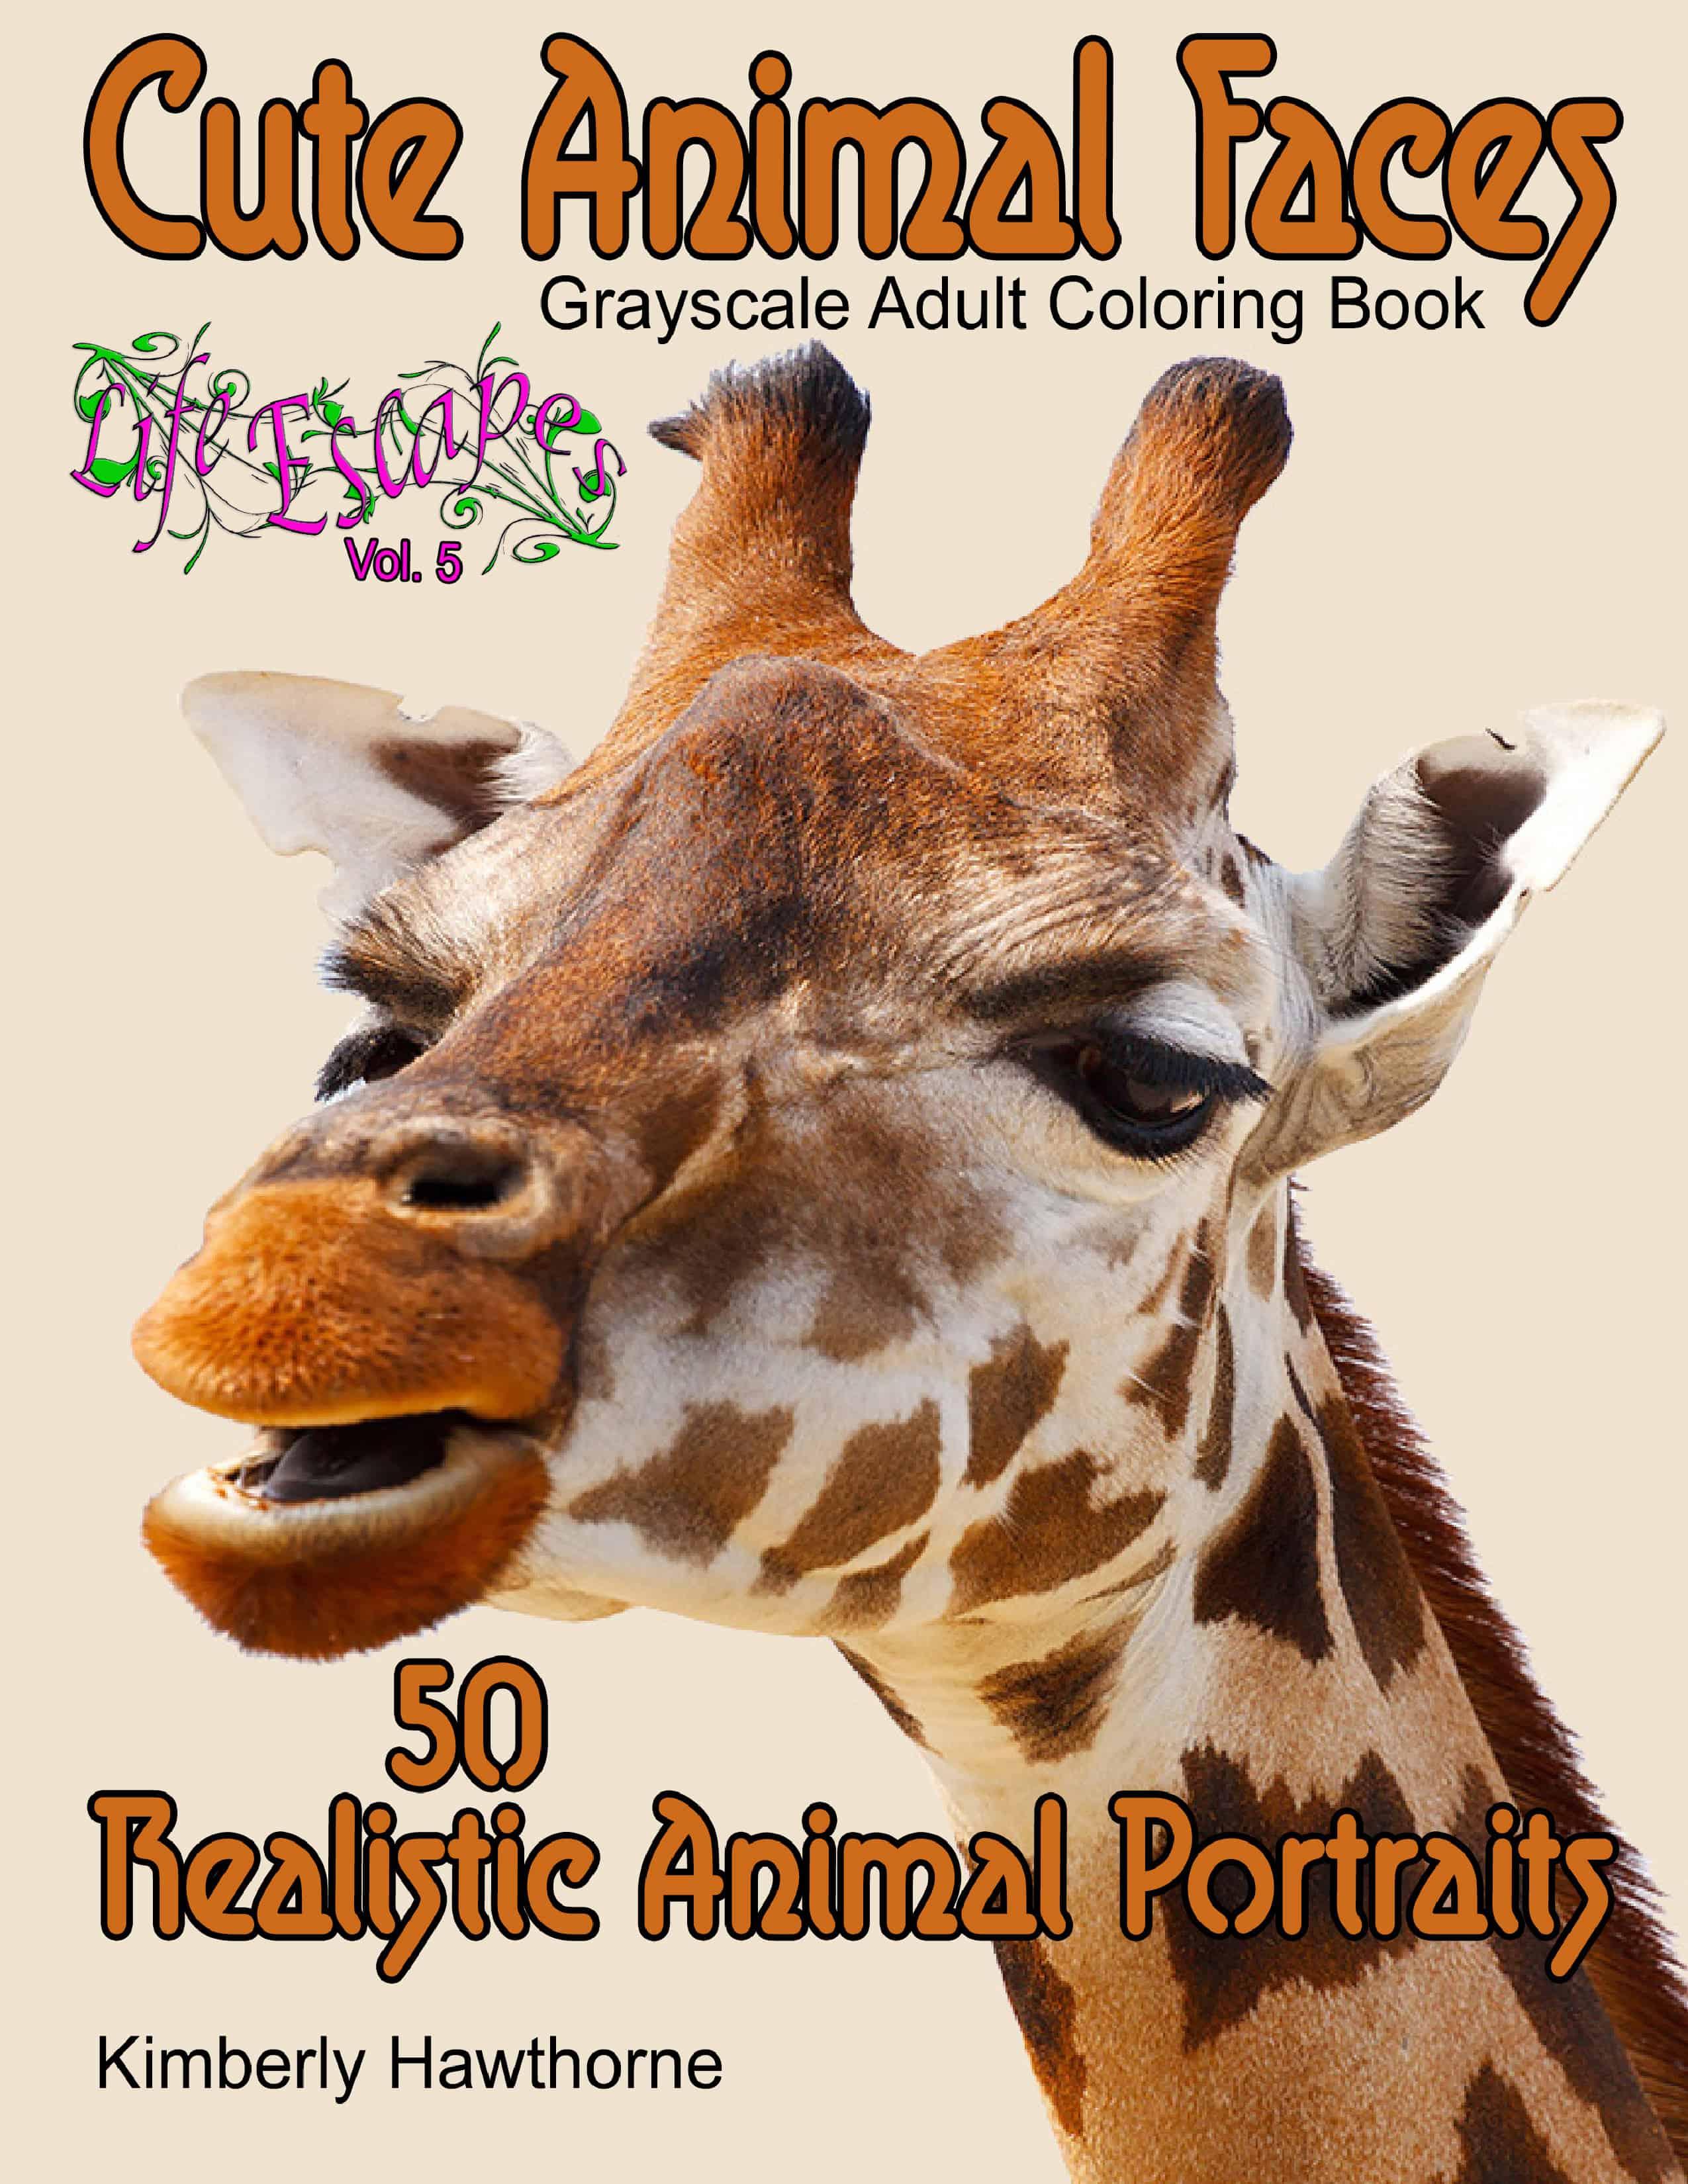 Life Escapes Adult Coloring Books Vol. 5 Cute Animal Faces